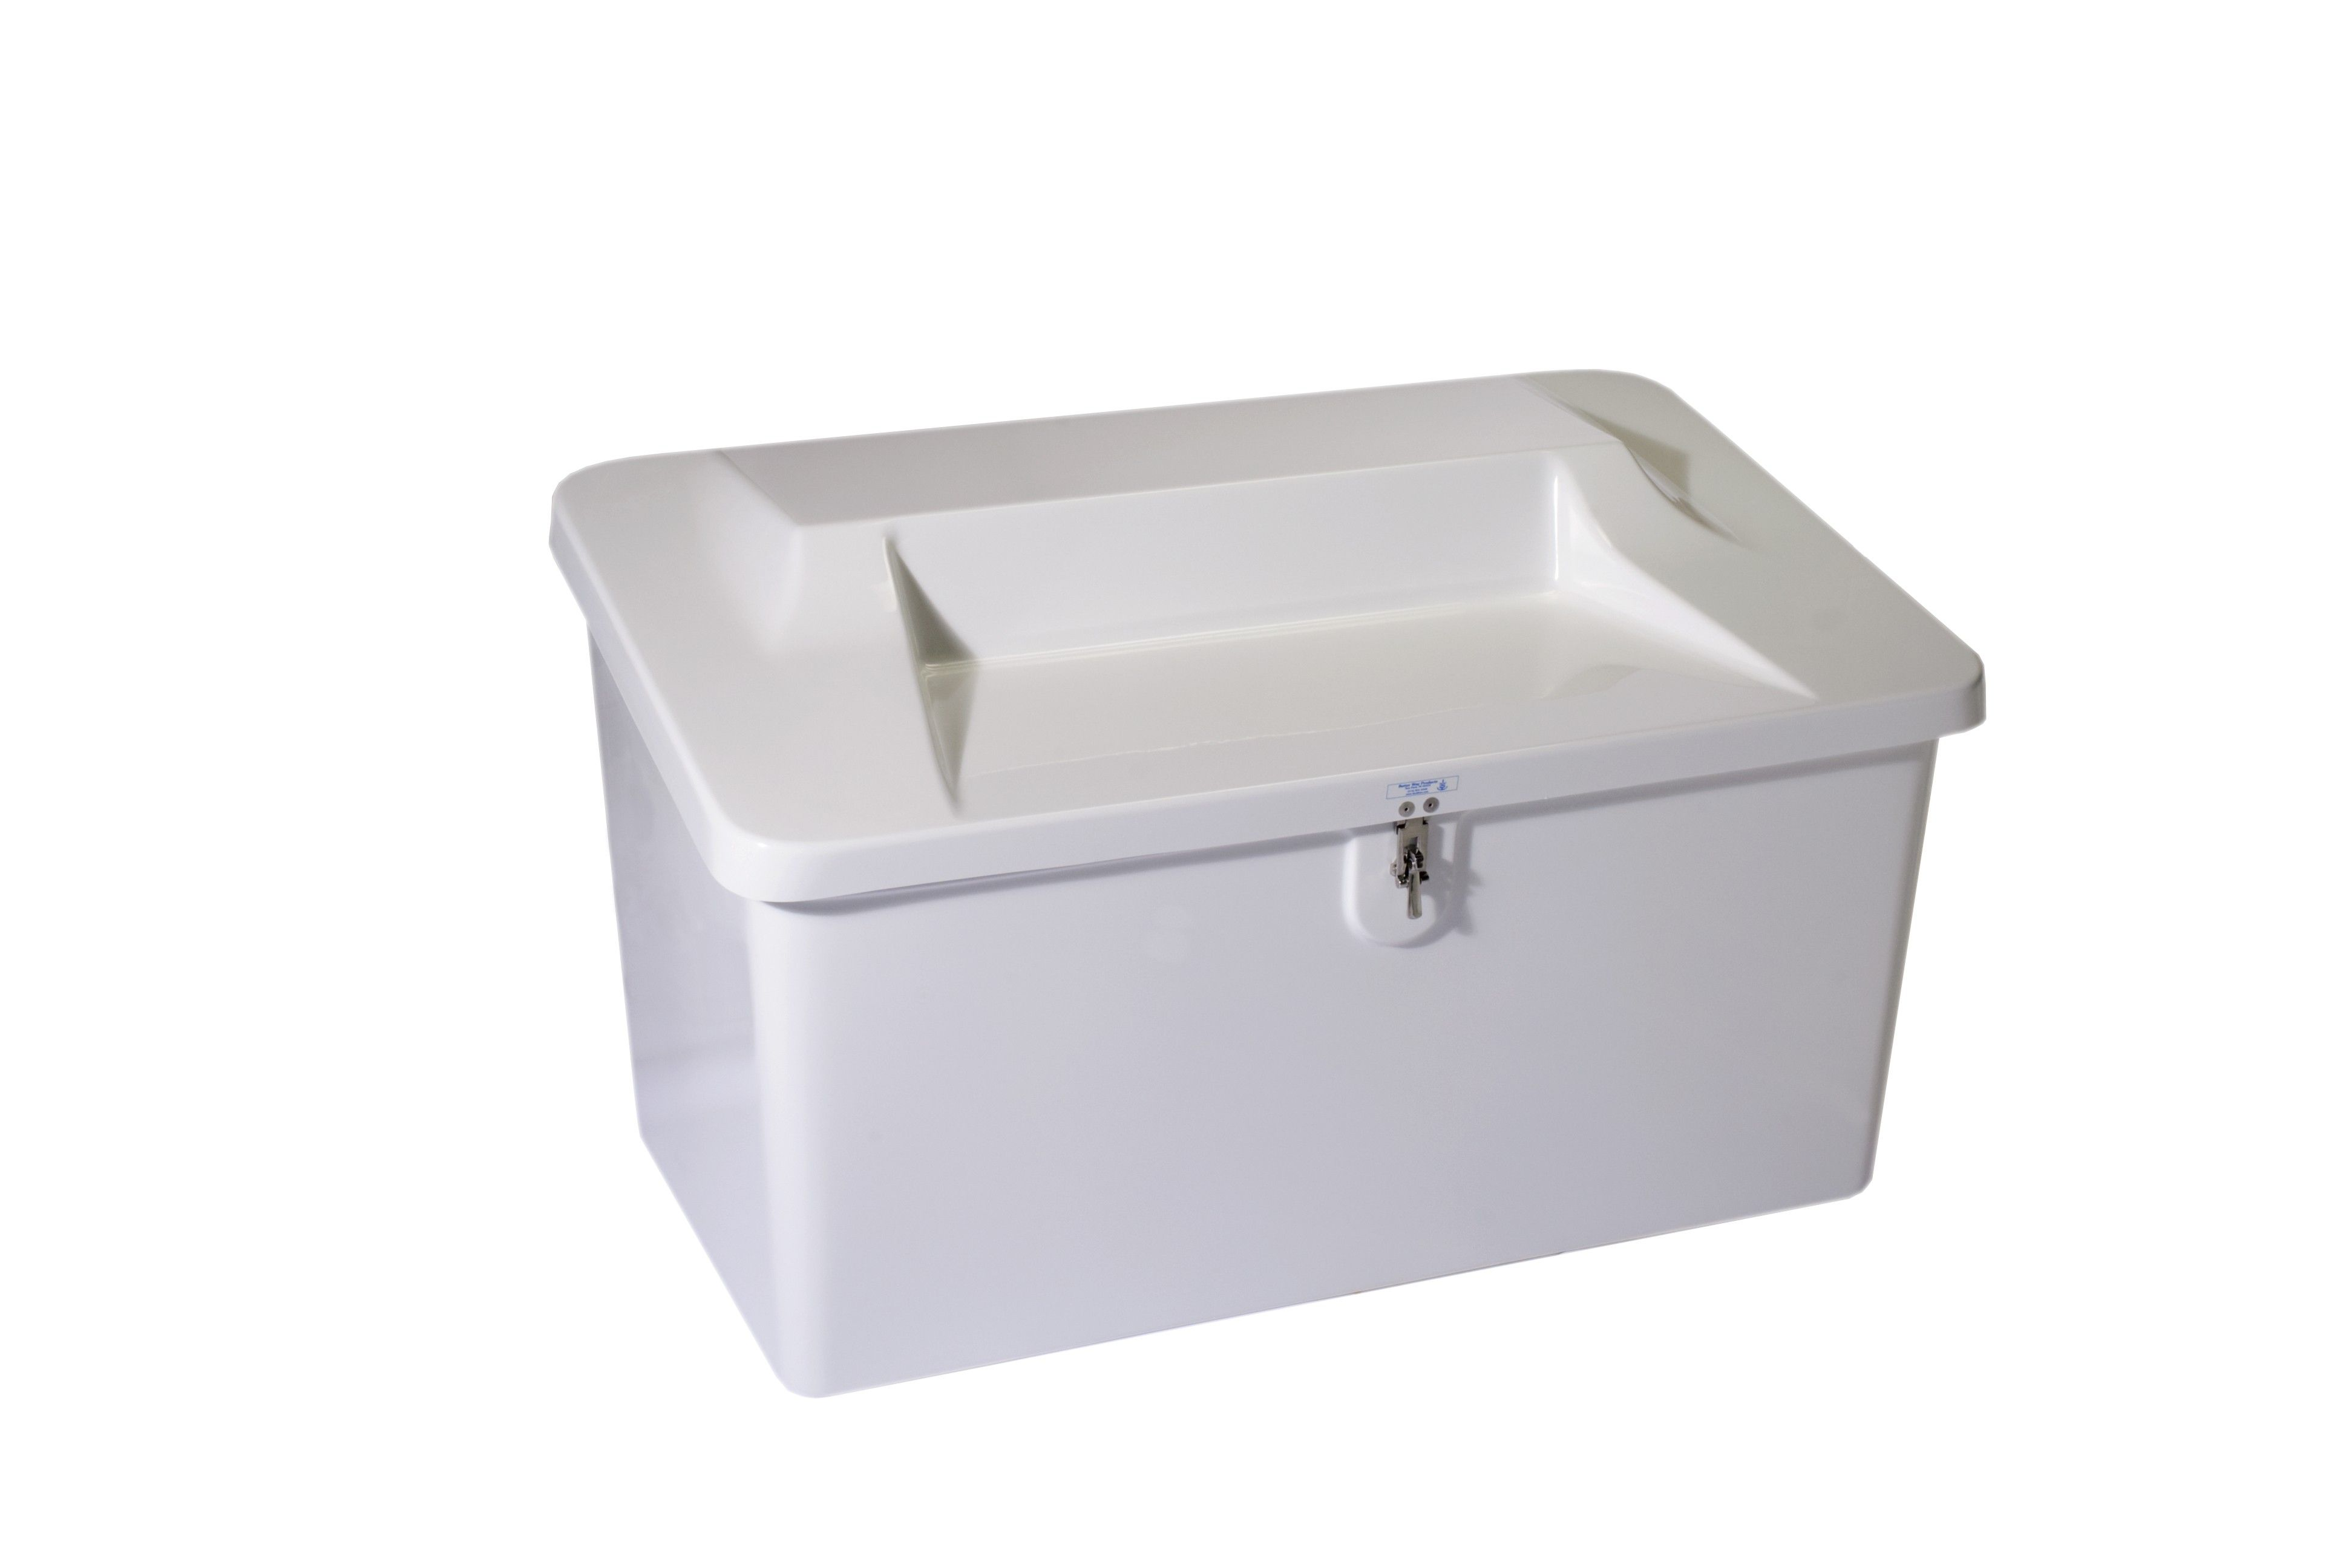 Fiberglass Dock Storage Box By Betterway Products 500st Storage